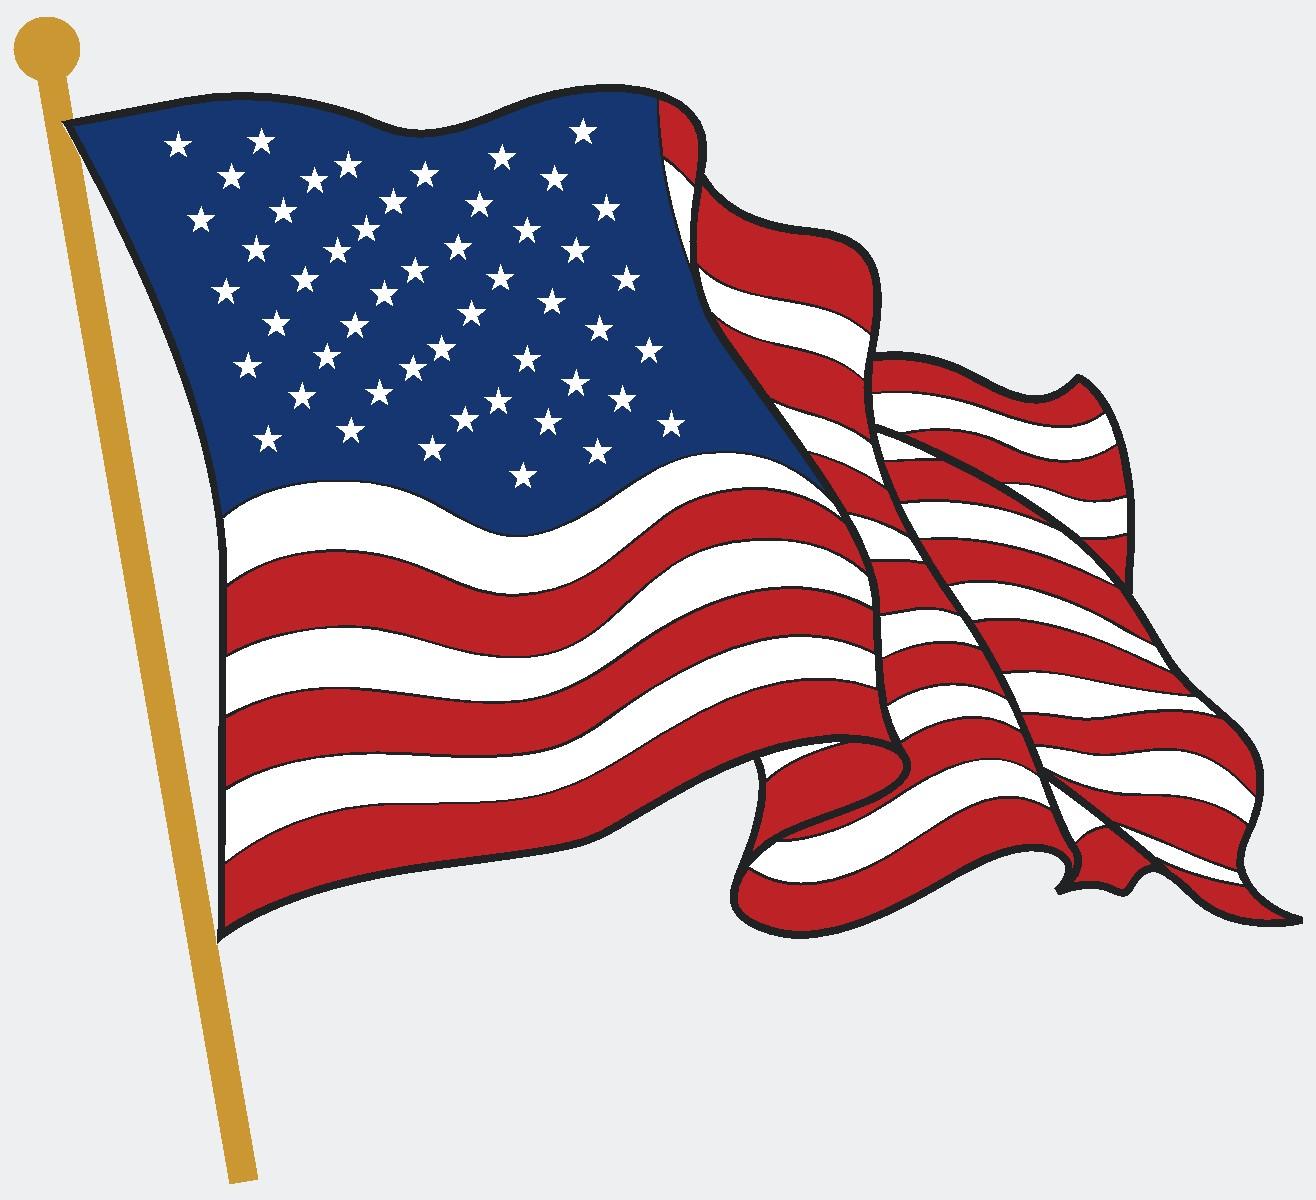 ... American Flag Free Flag Clip Art Cli-... American flag free flag clip art clipart cliparting 3 - Cliparting clipartall.com ...-5